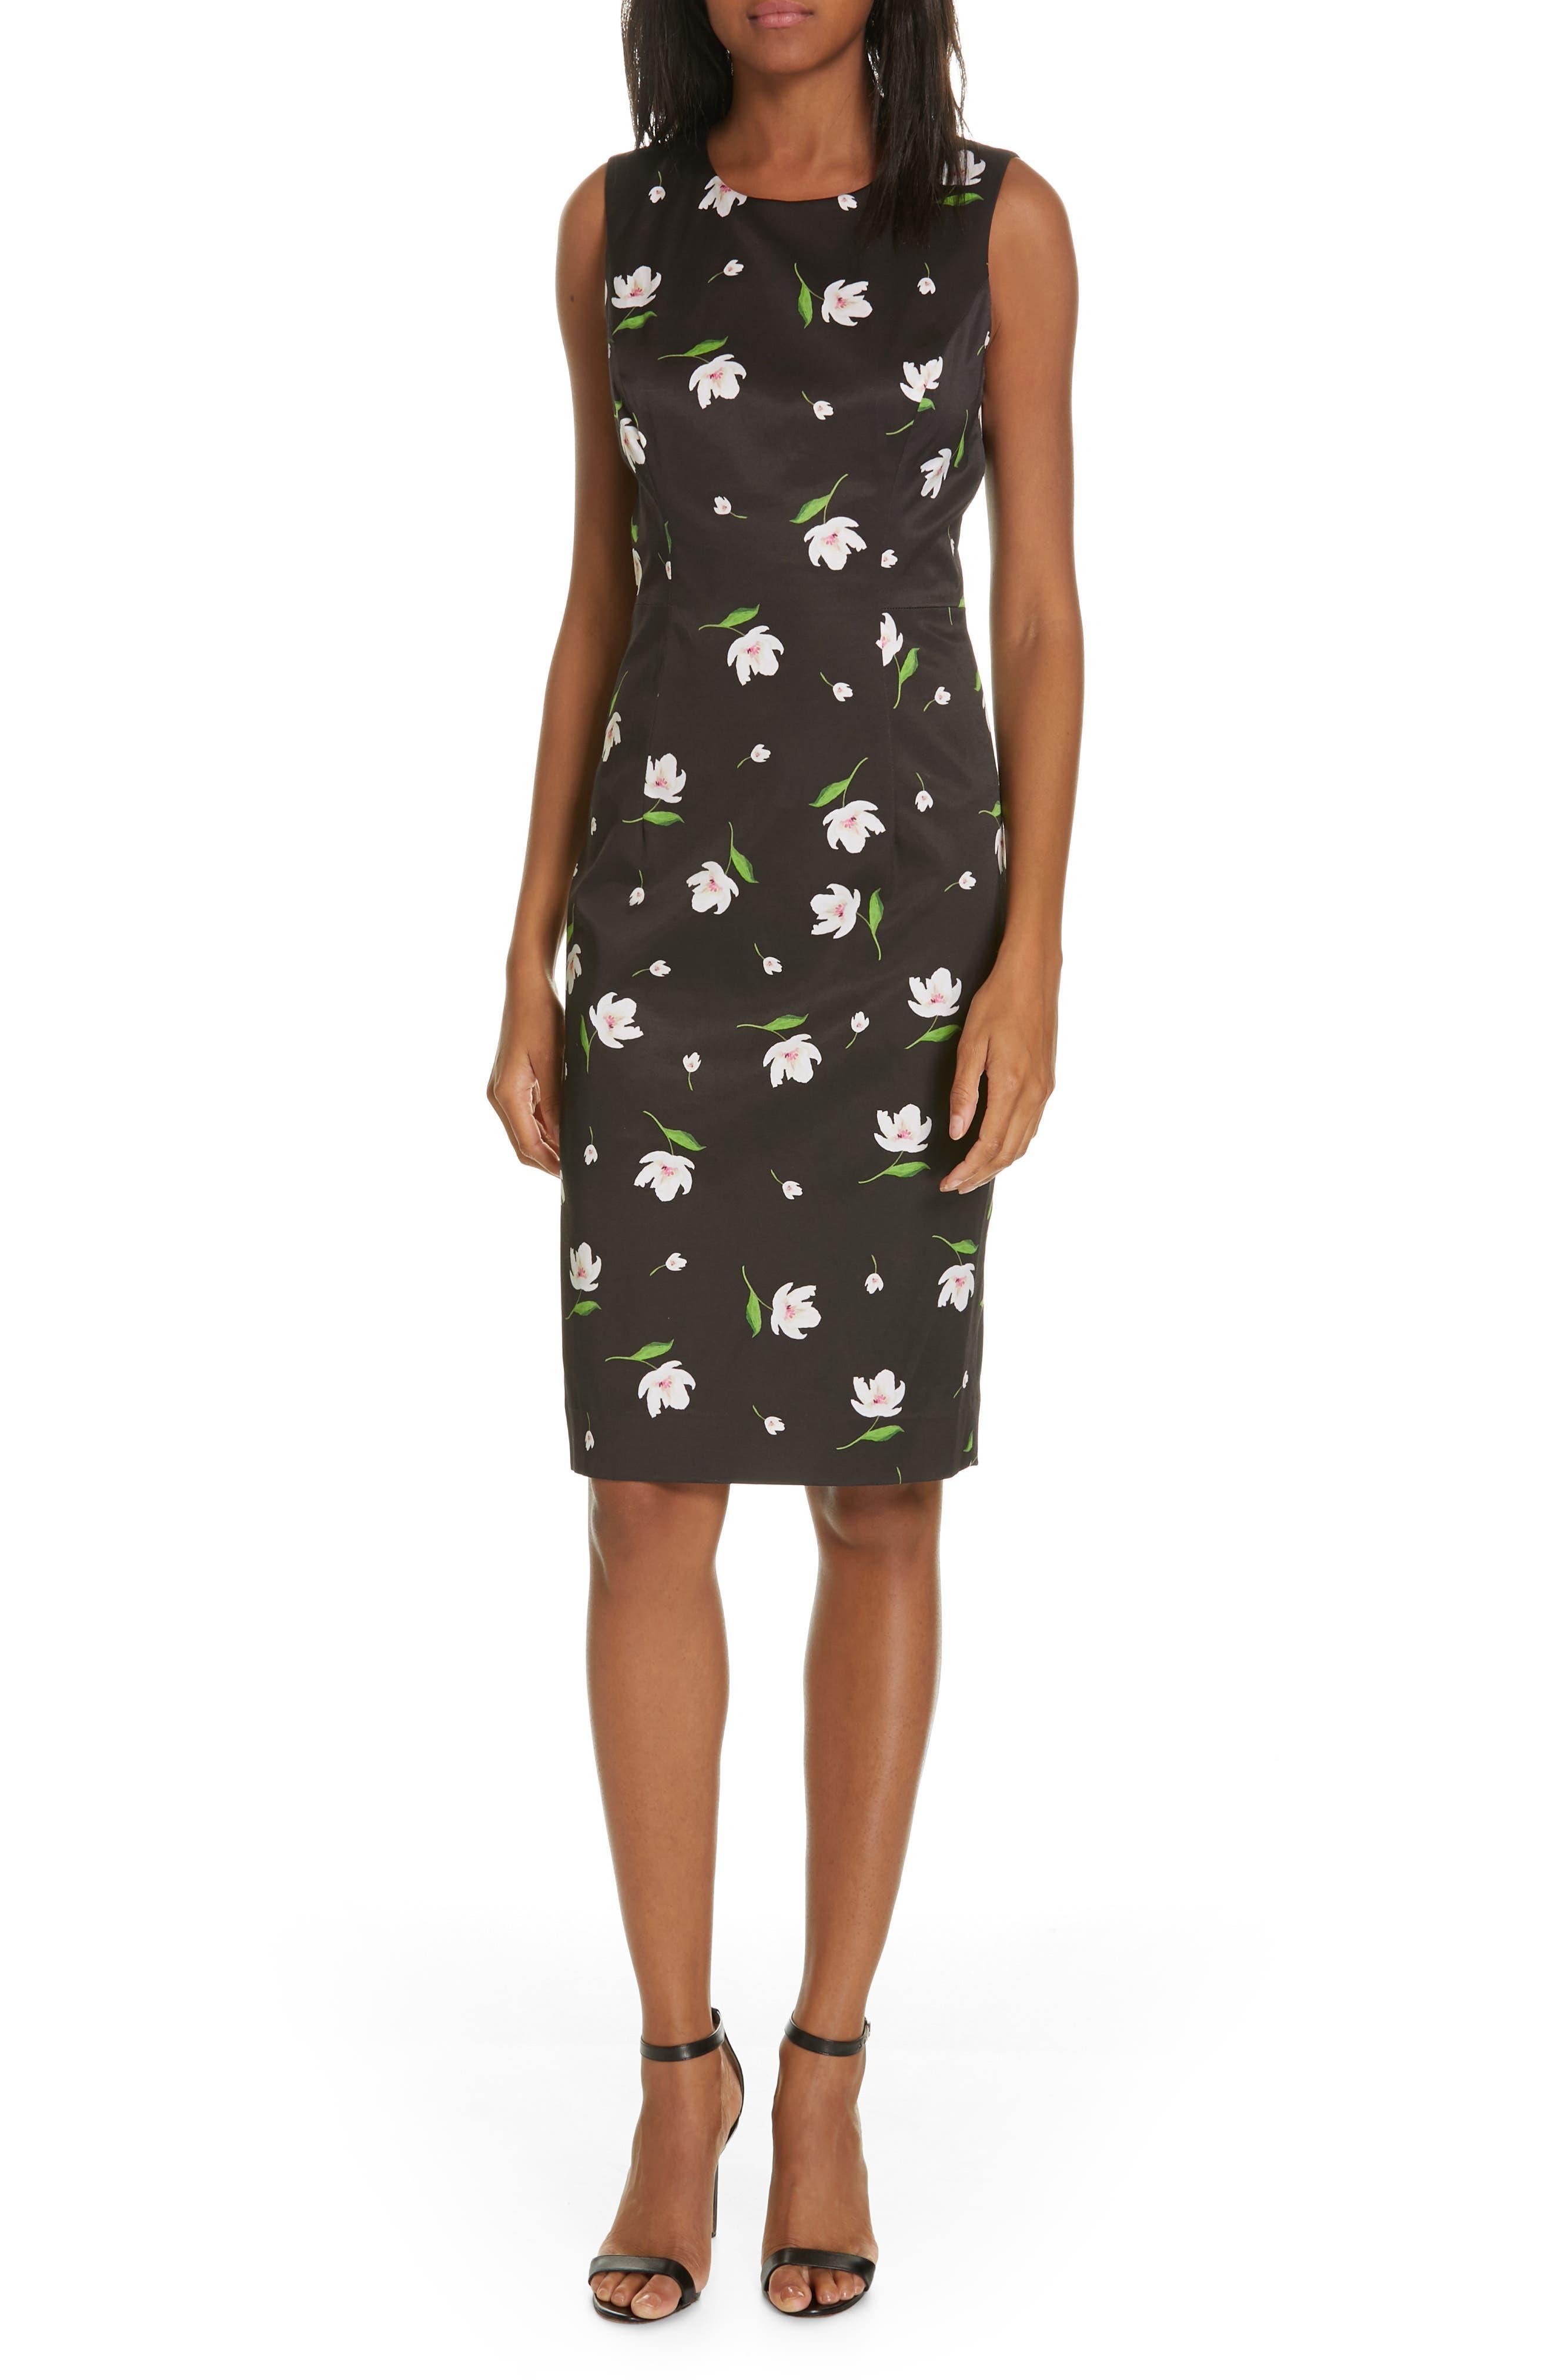 Milly Kendra Floral Print Sheath Dress, Black